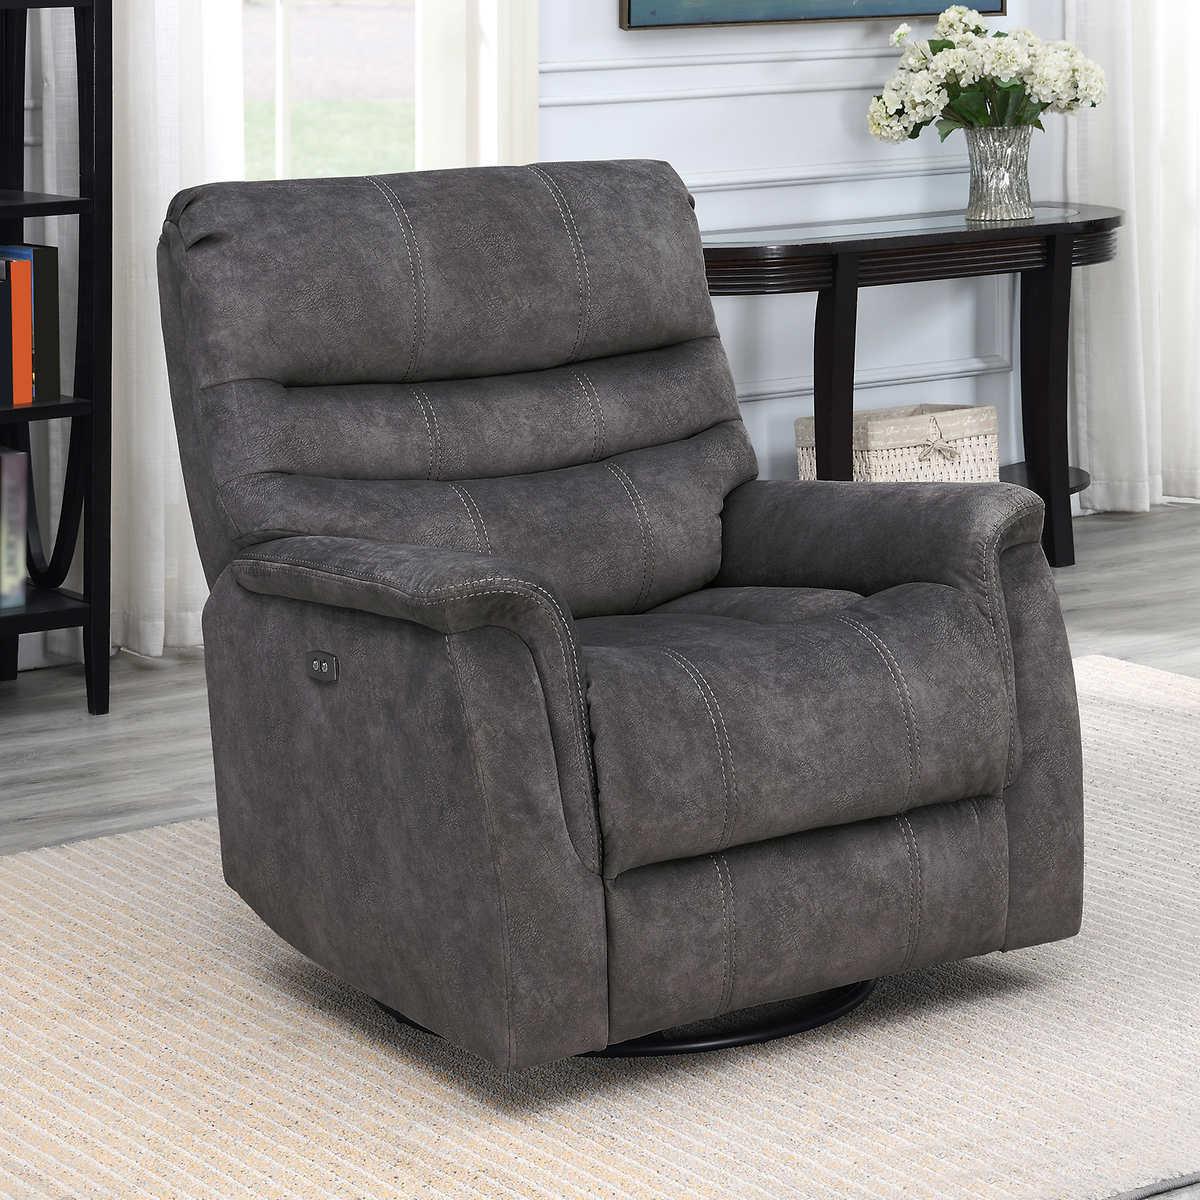 Enjoyable Thomasville Felix Fabric Power Swivel Glider Recliner Gamerscity Chair Design For Home Gamerscityorg